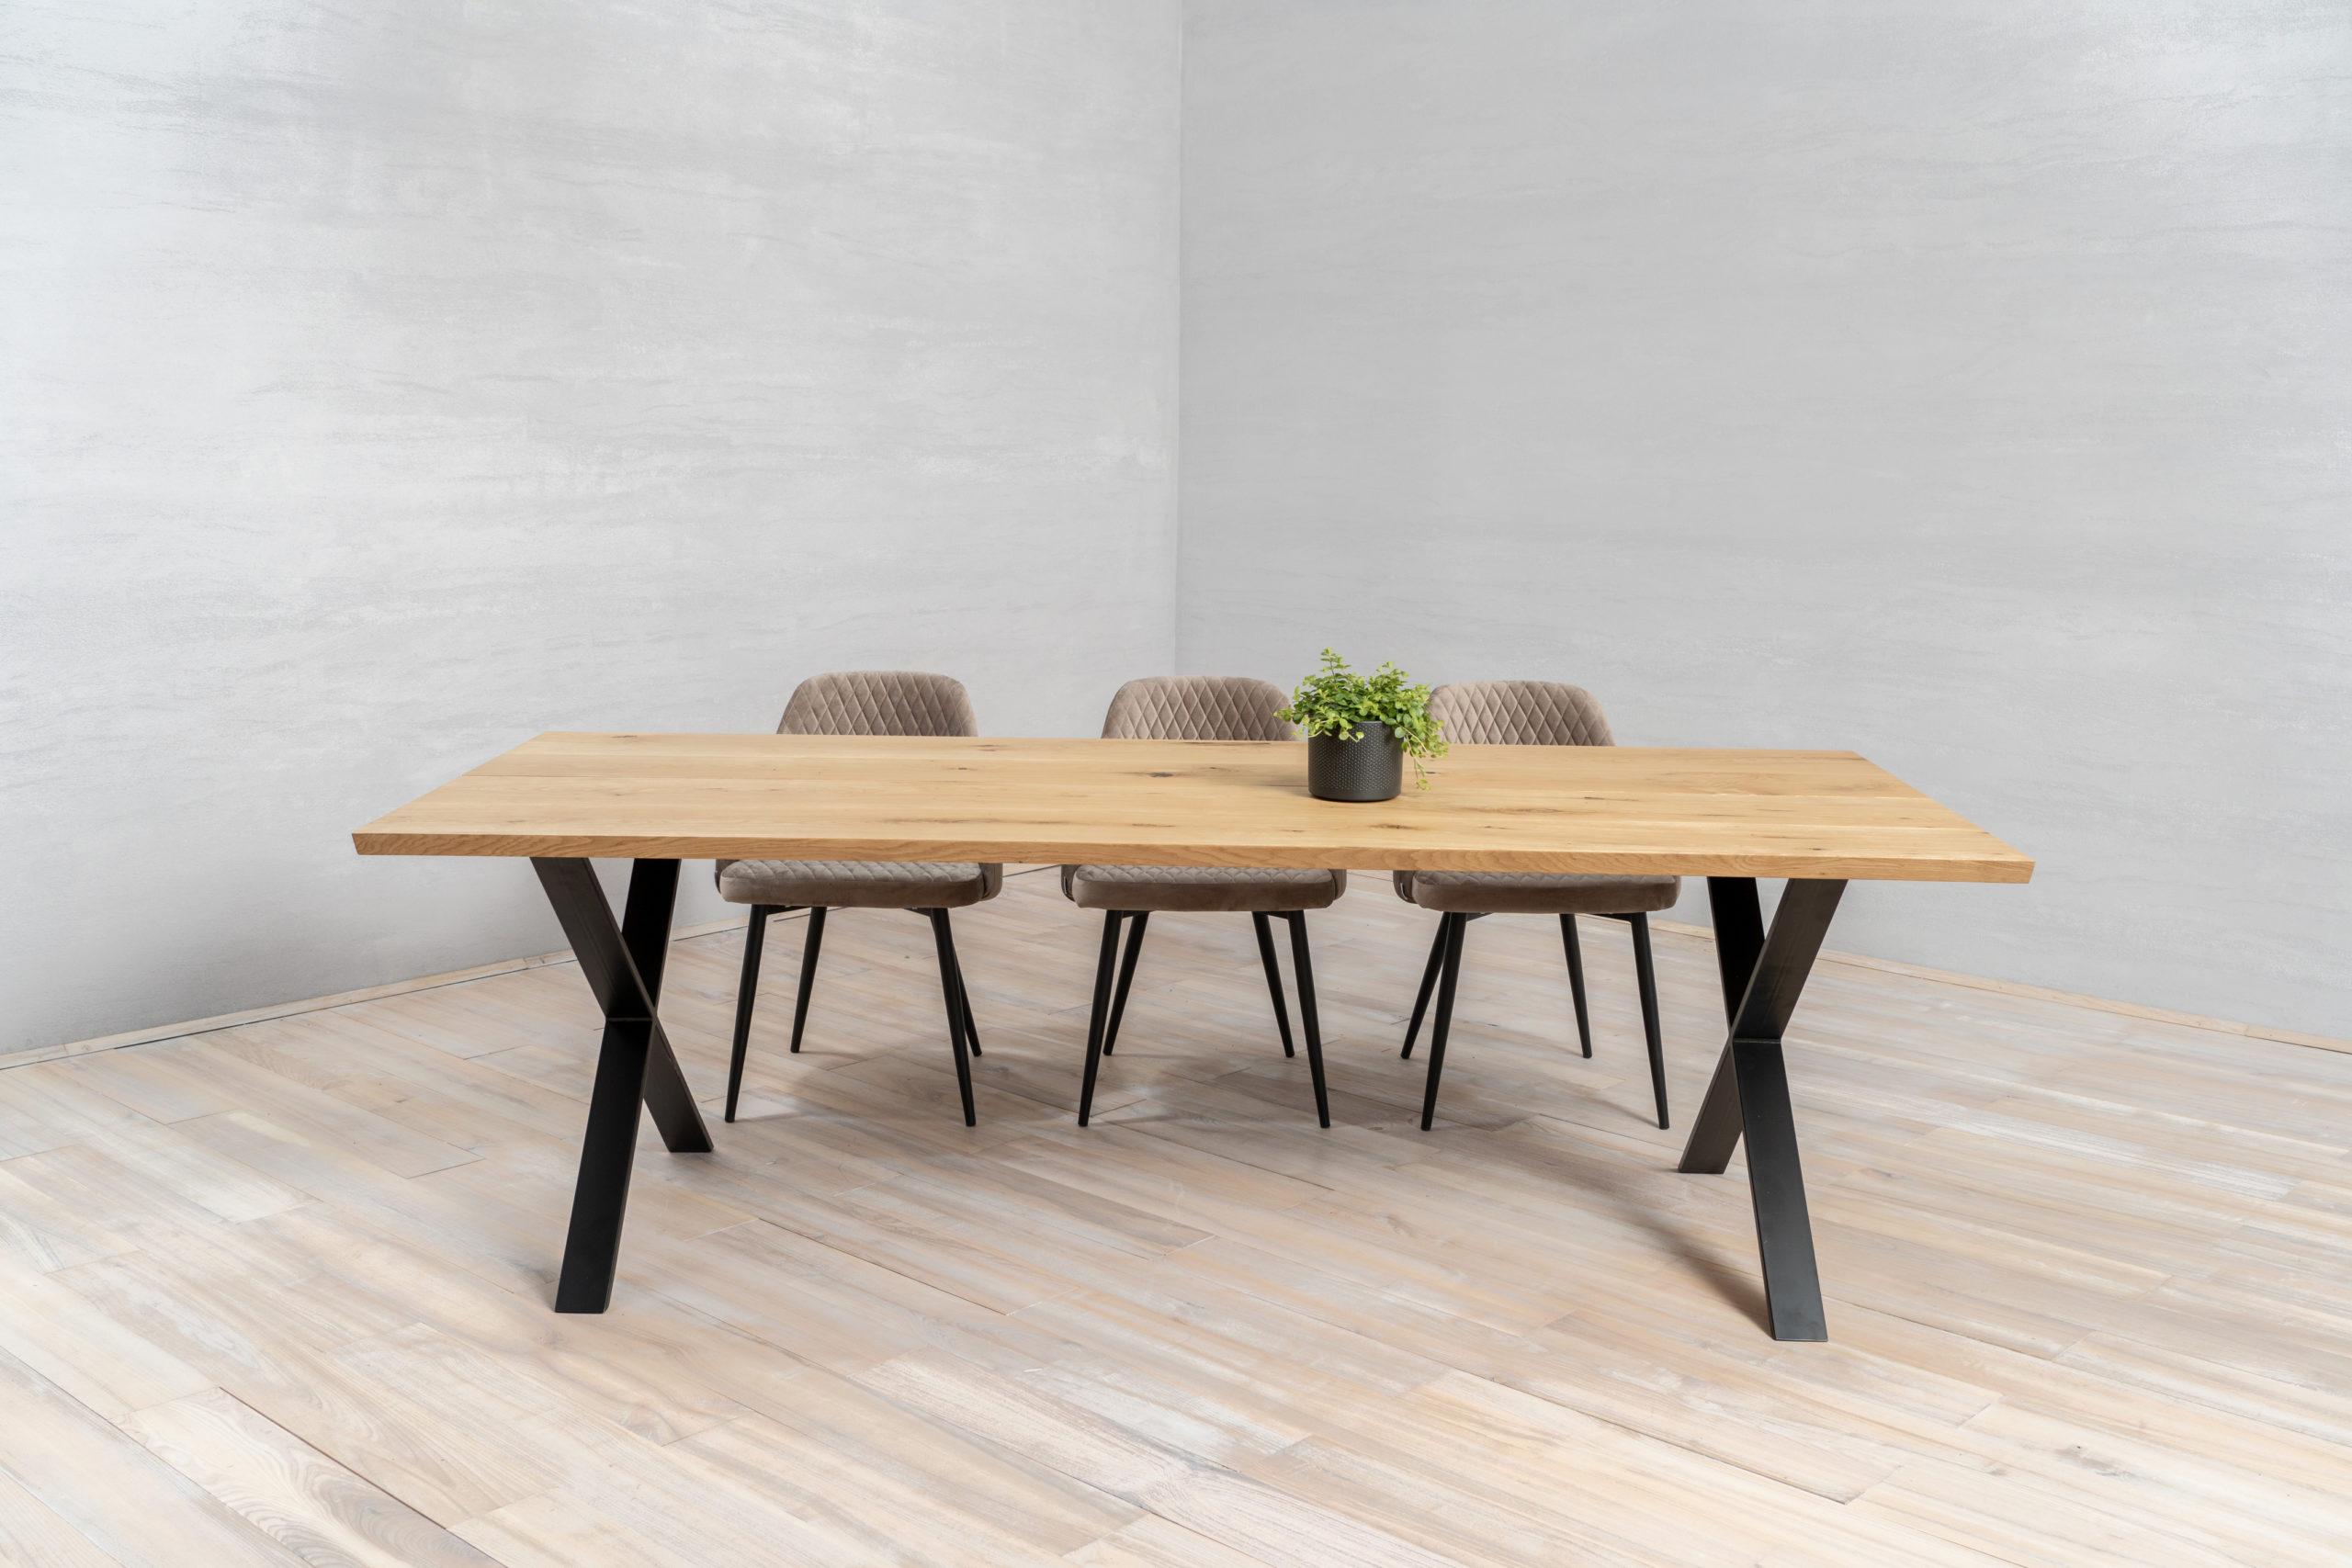 natural wood table top